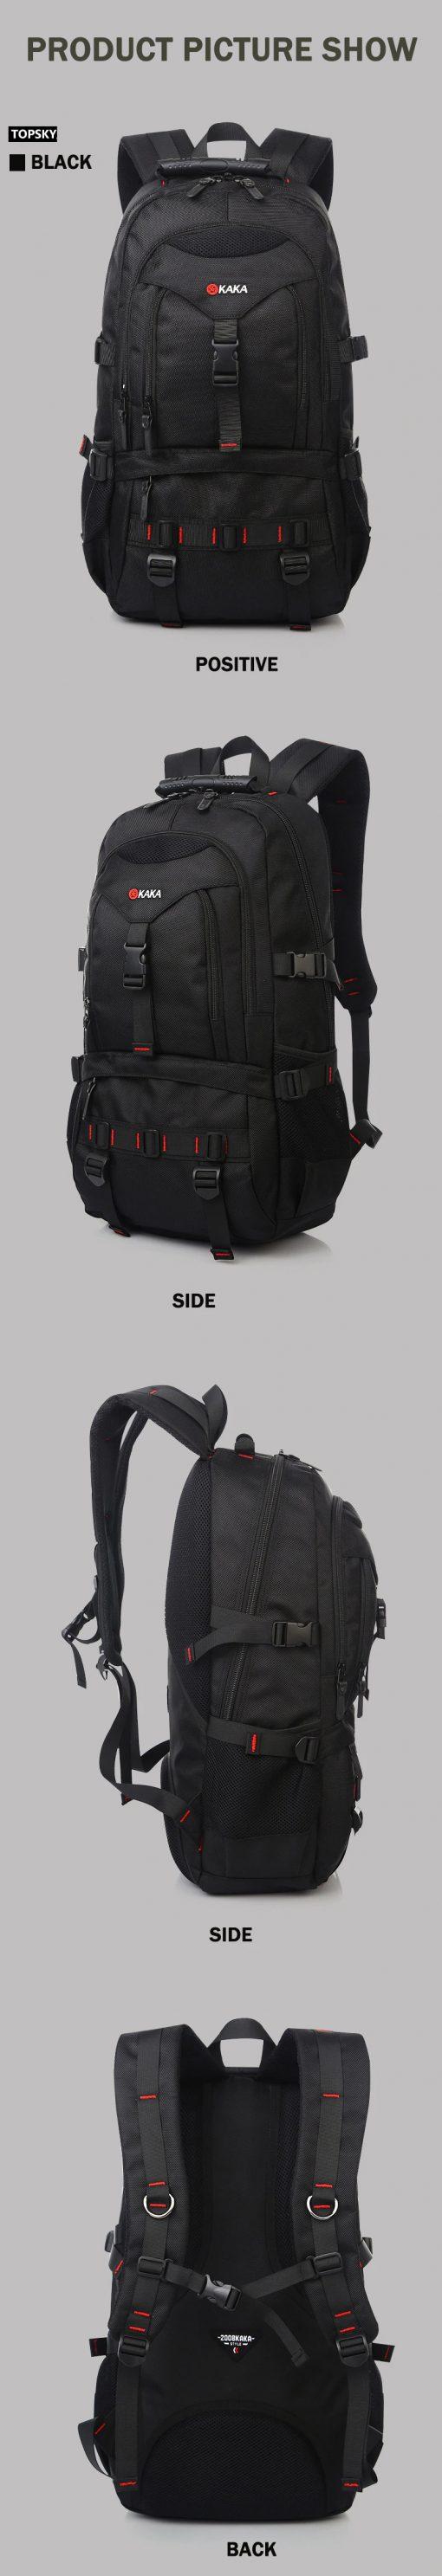 KAKA 35L Water Resistance Backpack 5